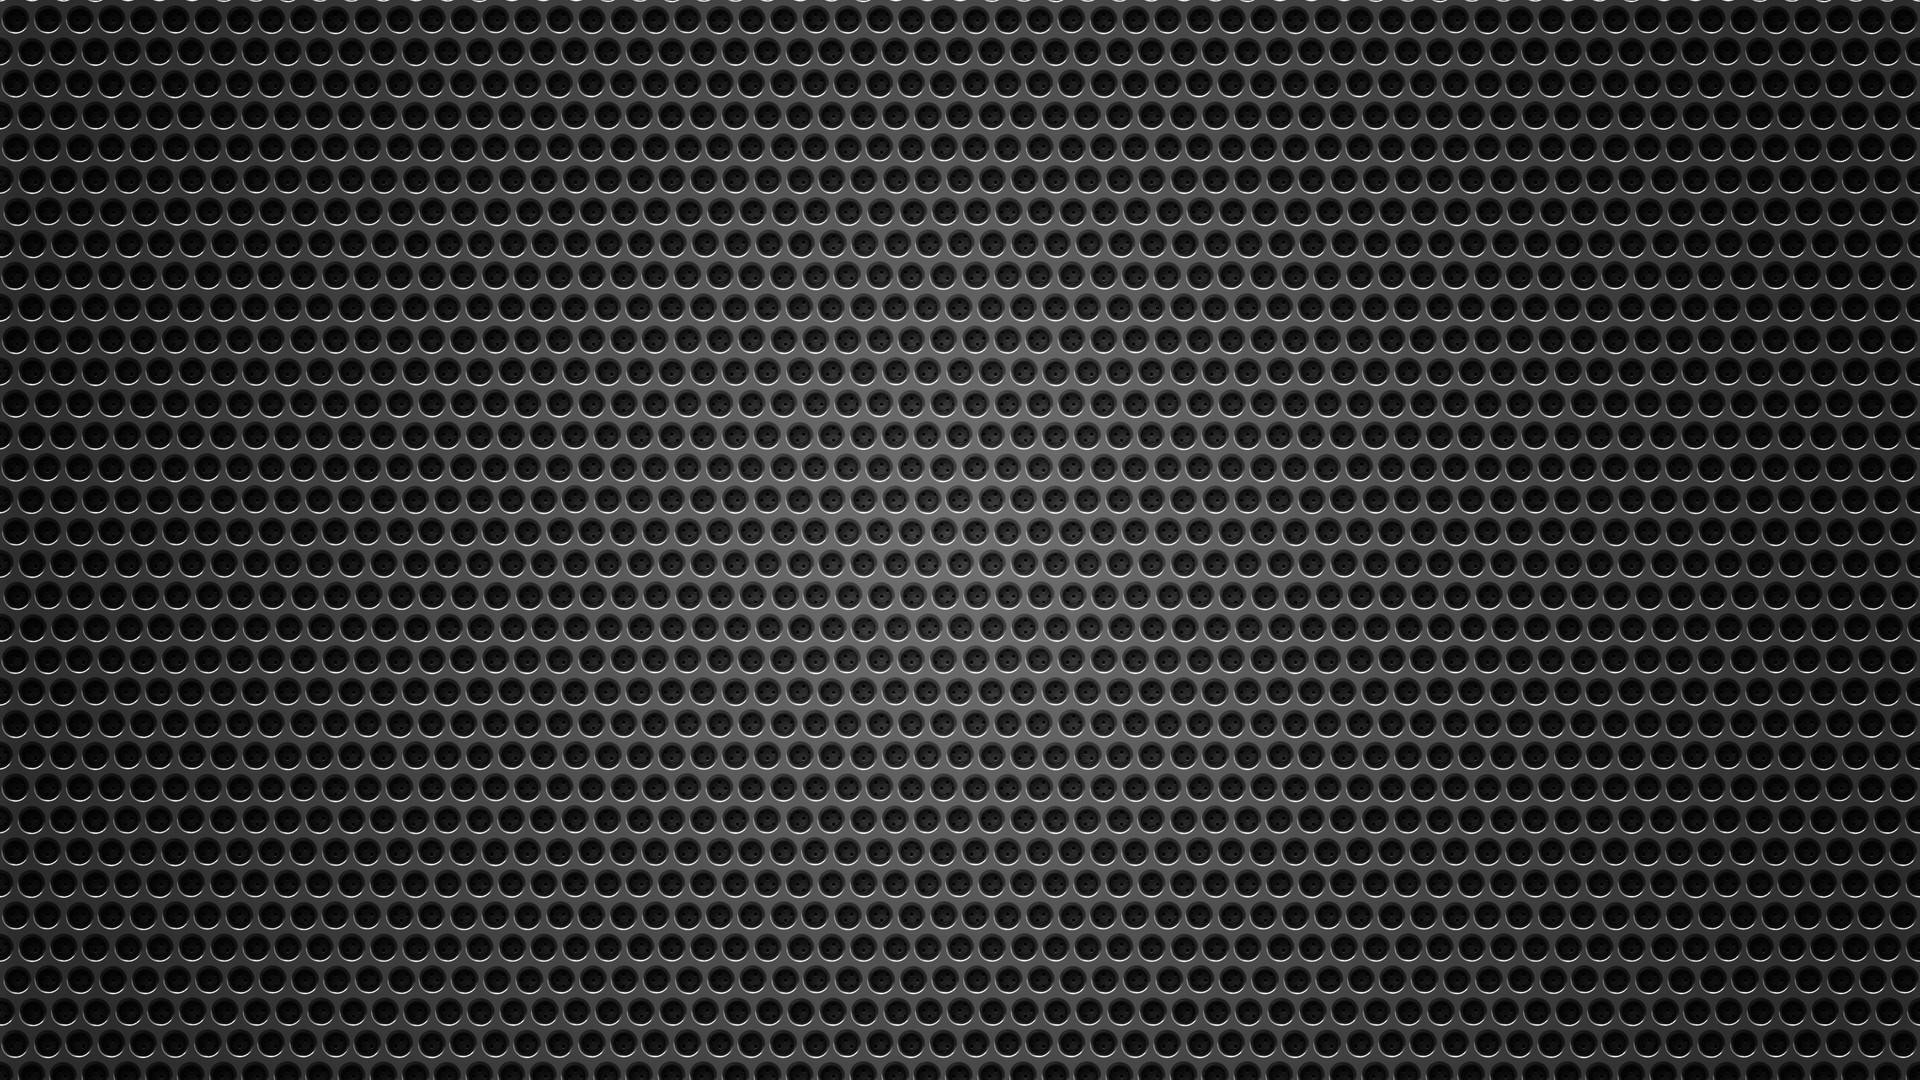 Grid circles background metal dark wallpaper background full